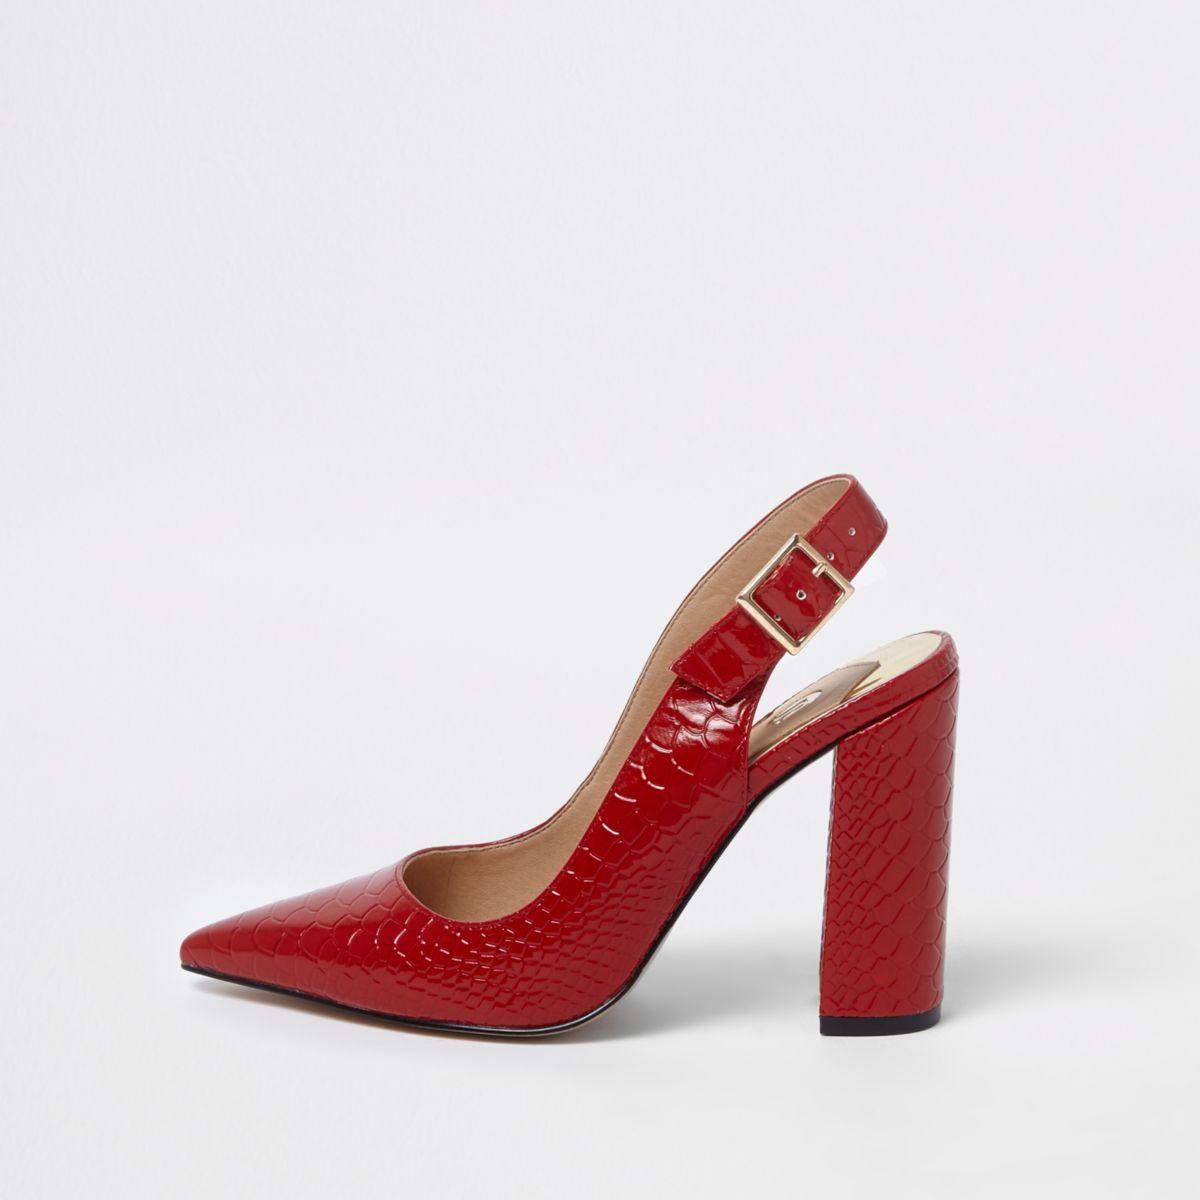 Red croc block heel sling back pumps